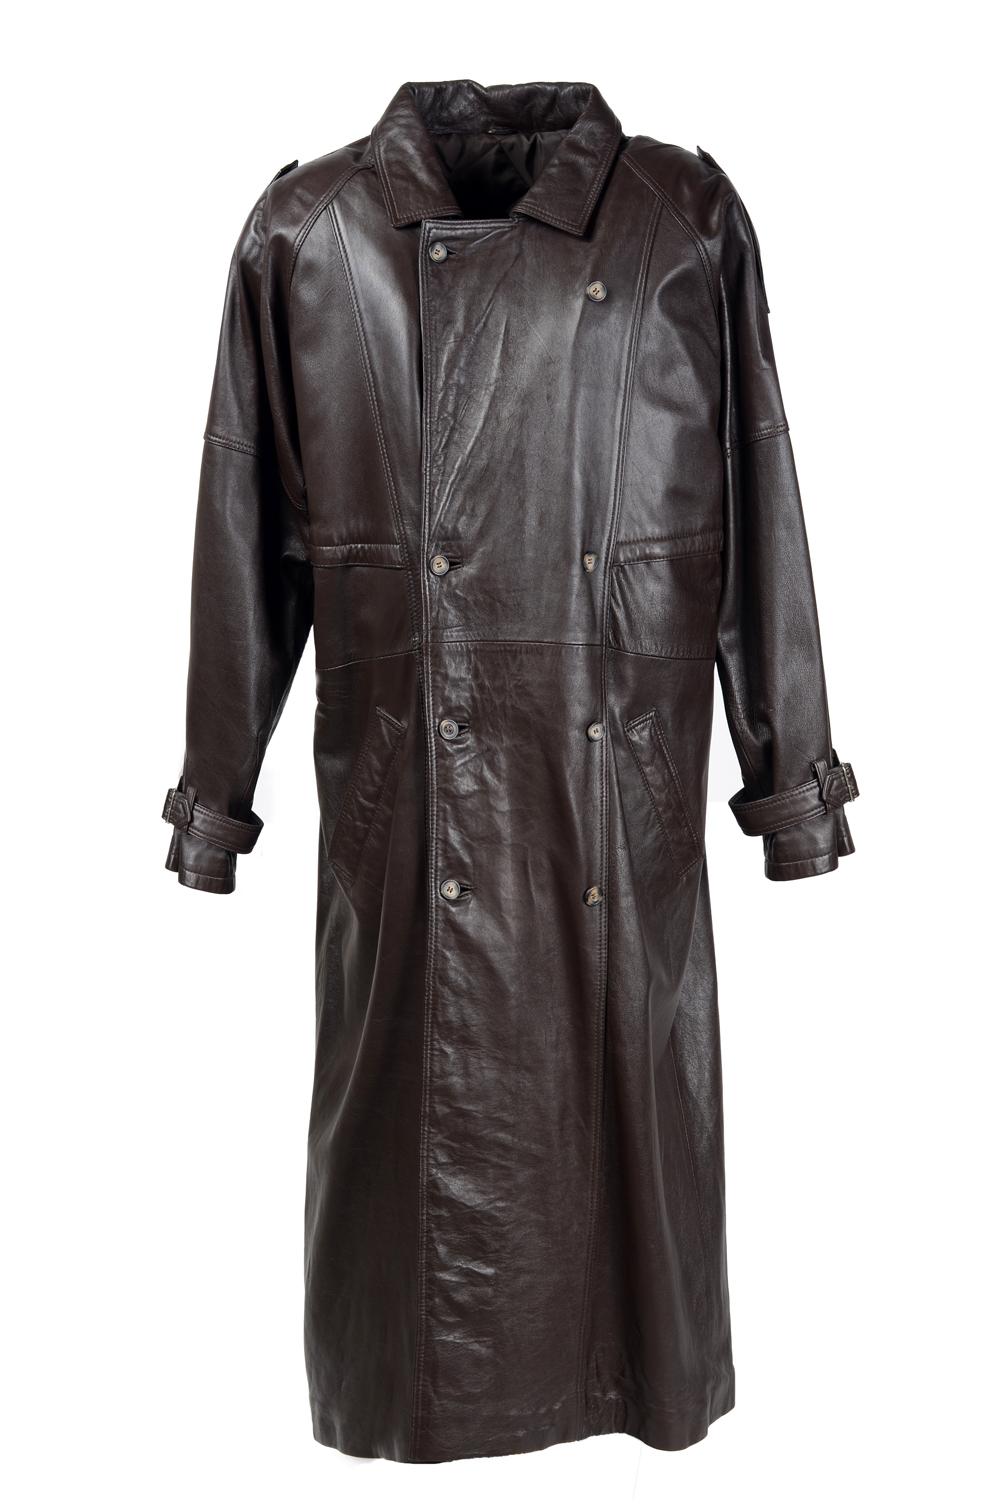 28b0874808c Pánské oděvy   Kožené oděvy   Kožené kabáty